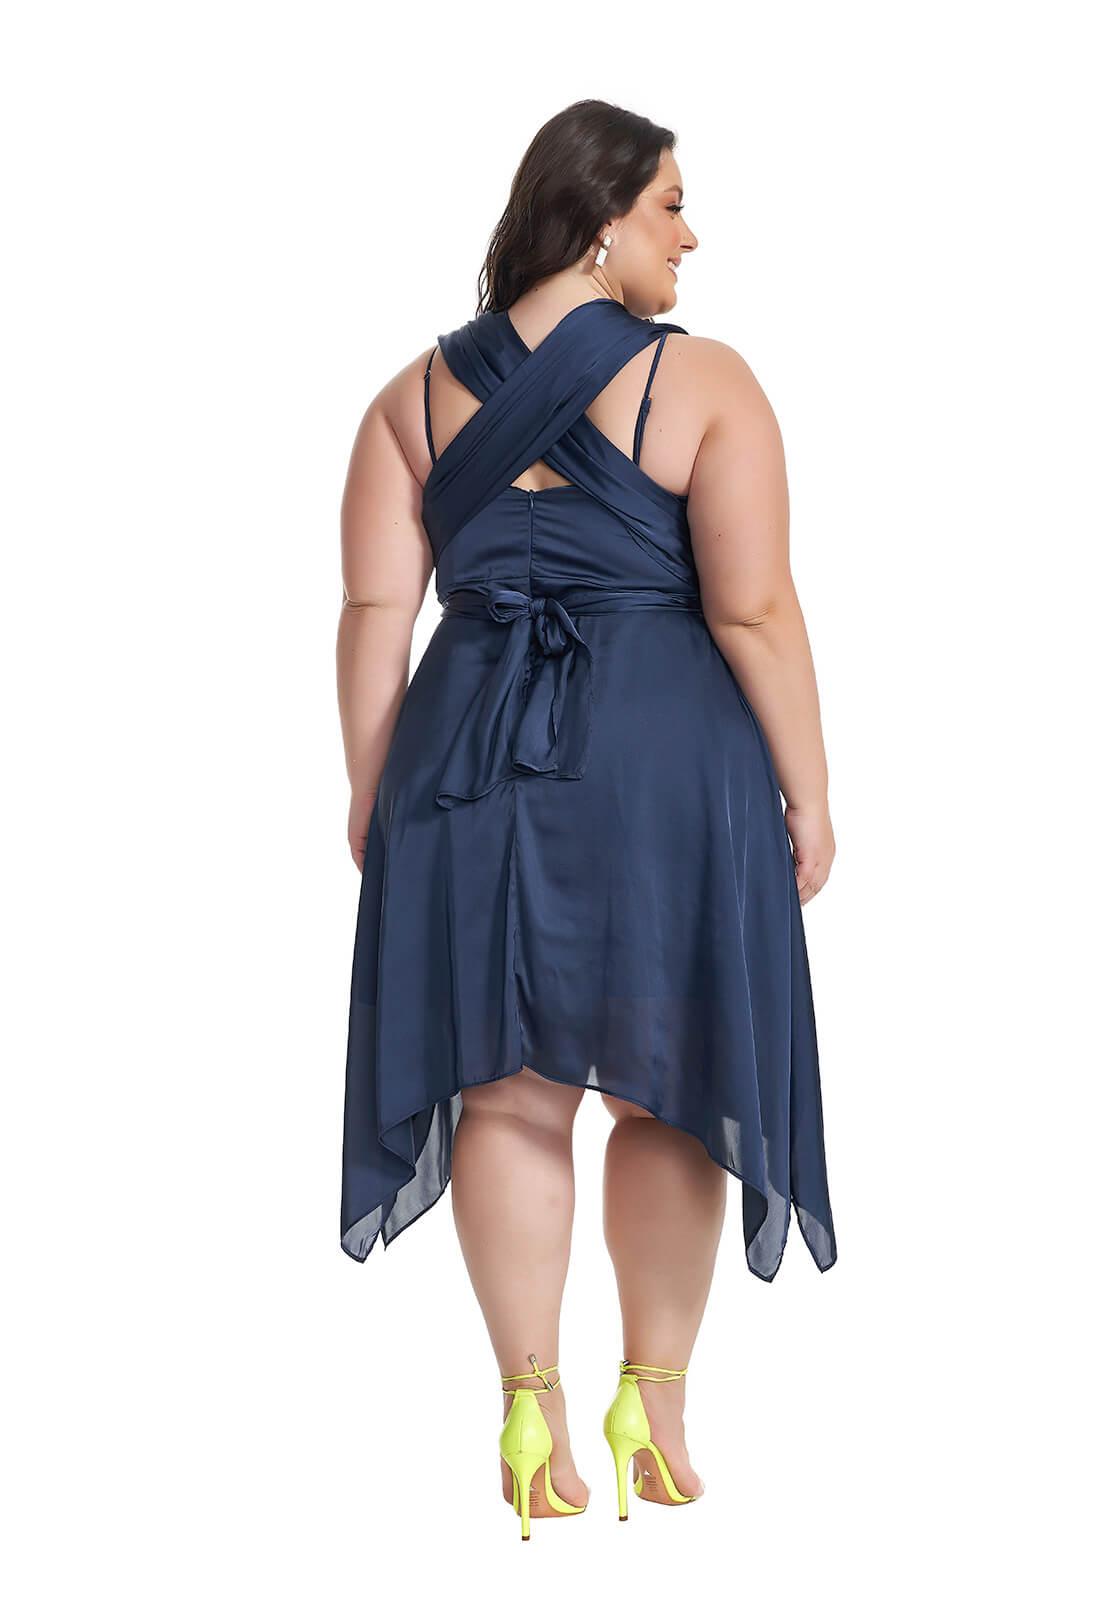 Vestido Assimétrico Mil Formas Plus Size Marinho